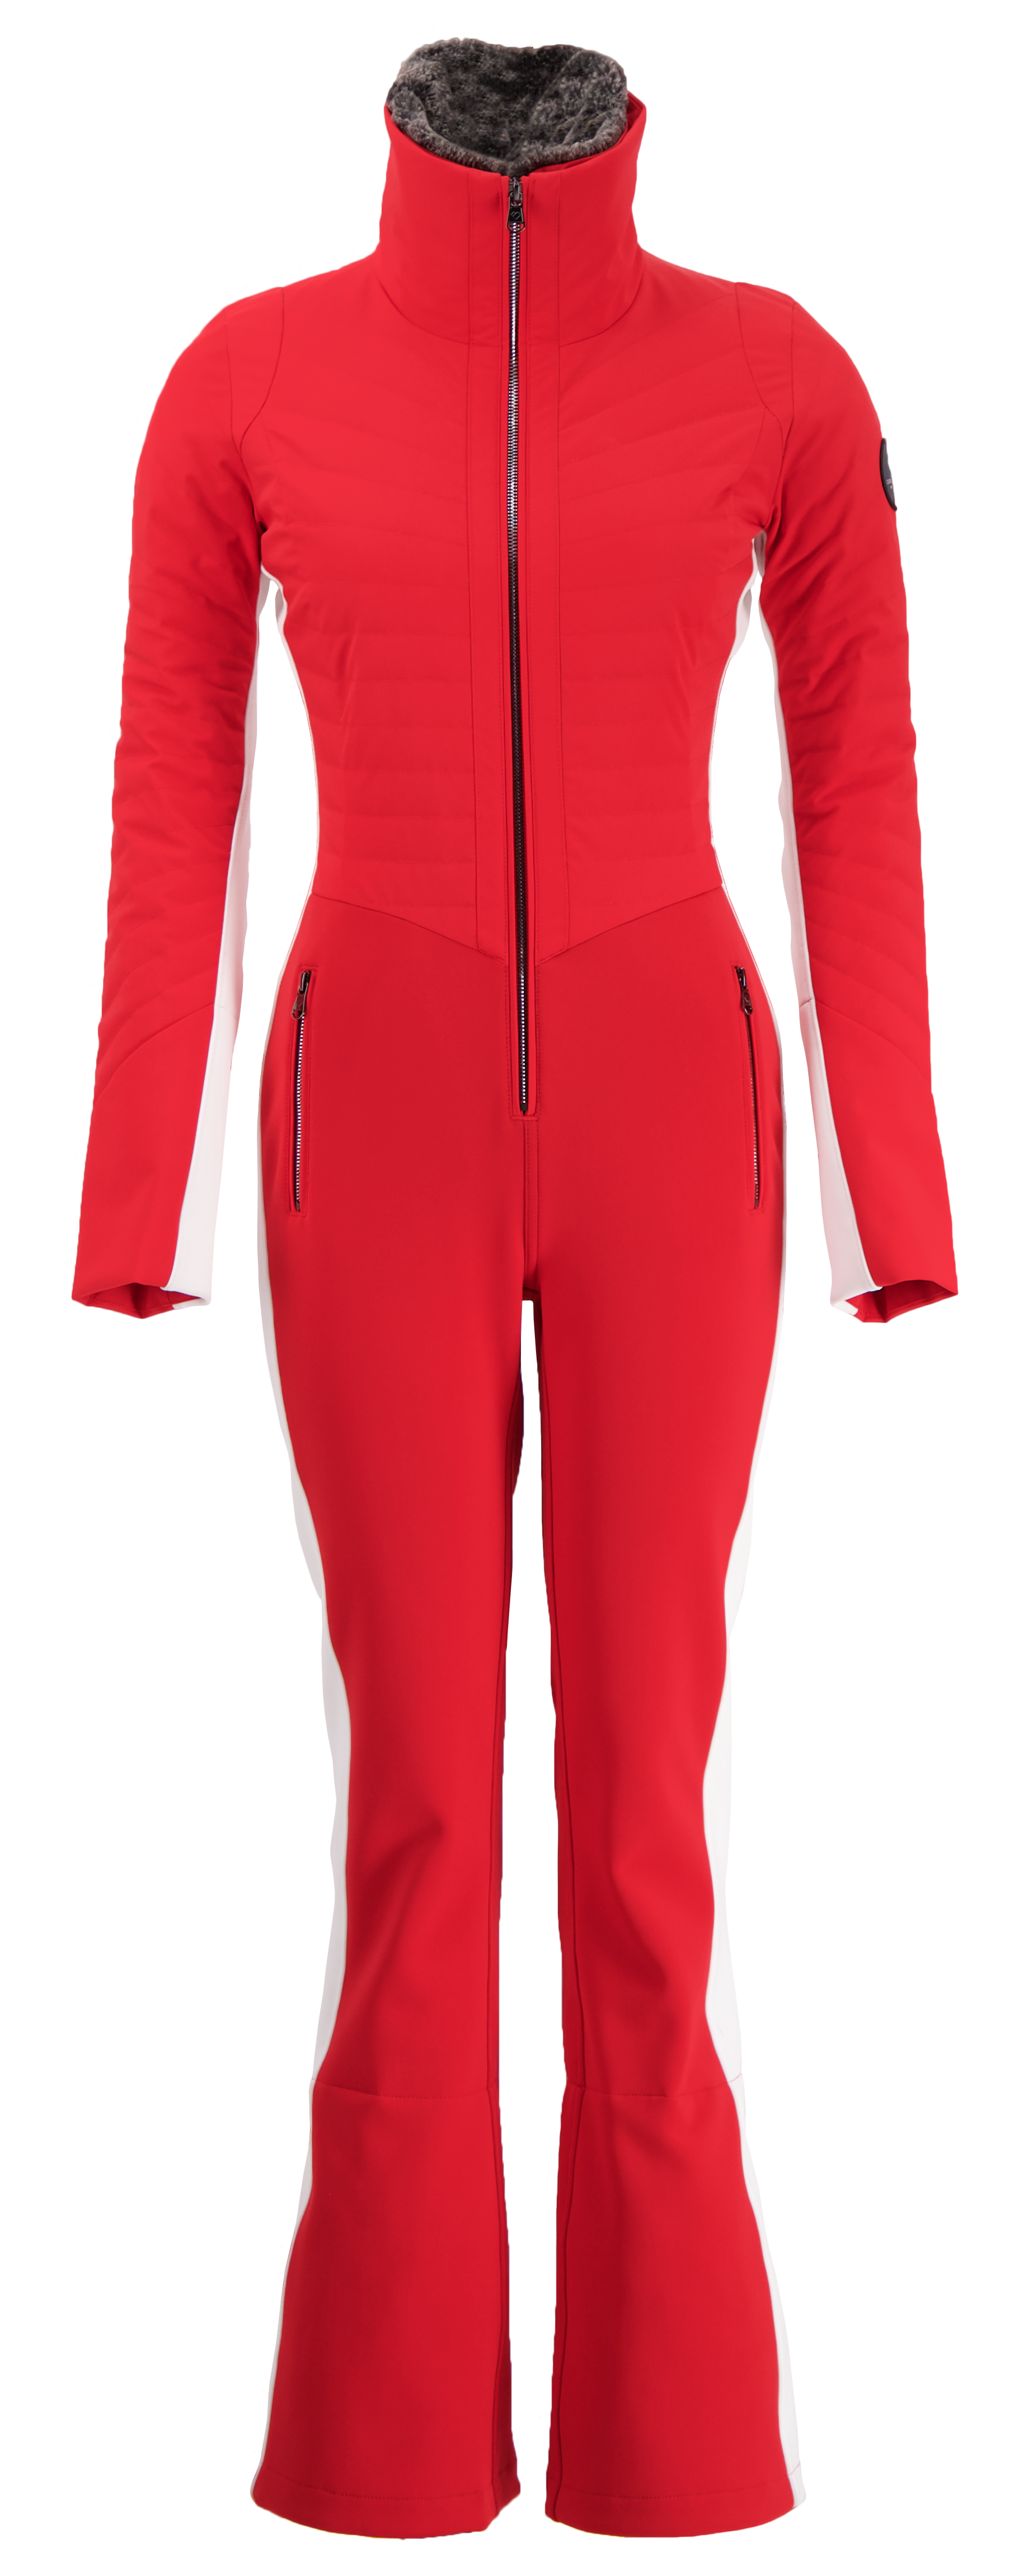 Lindsey Vonn...Greatest Racer Ever? feat